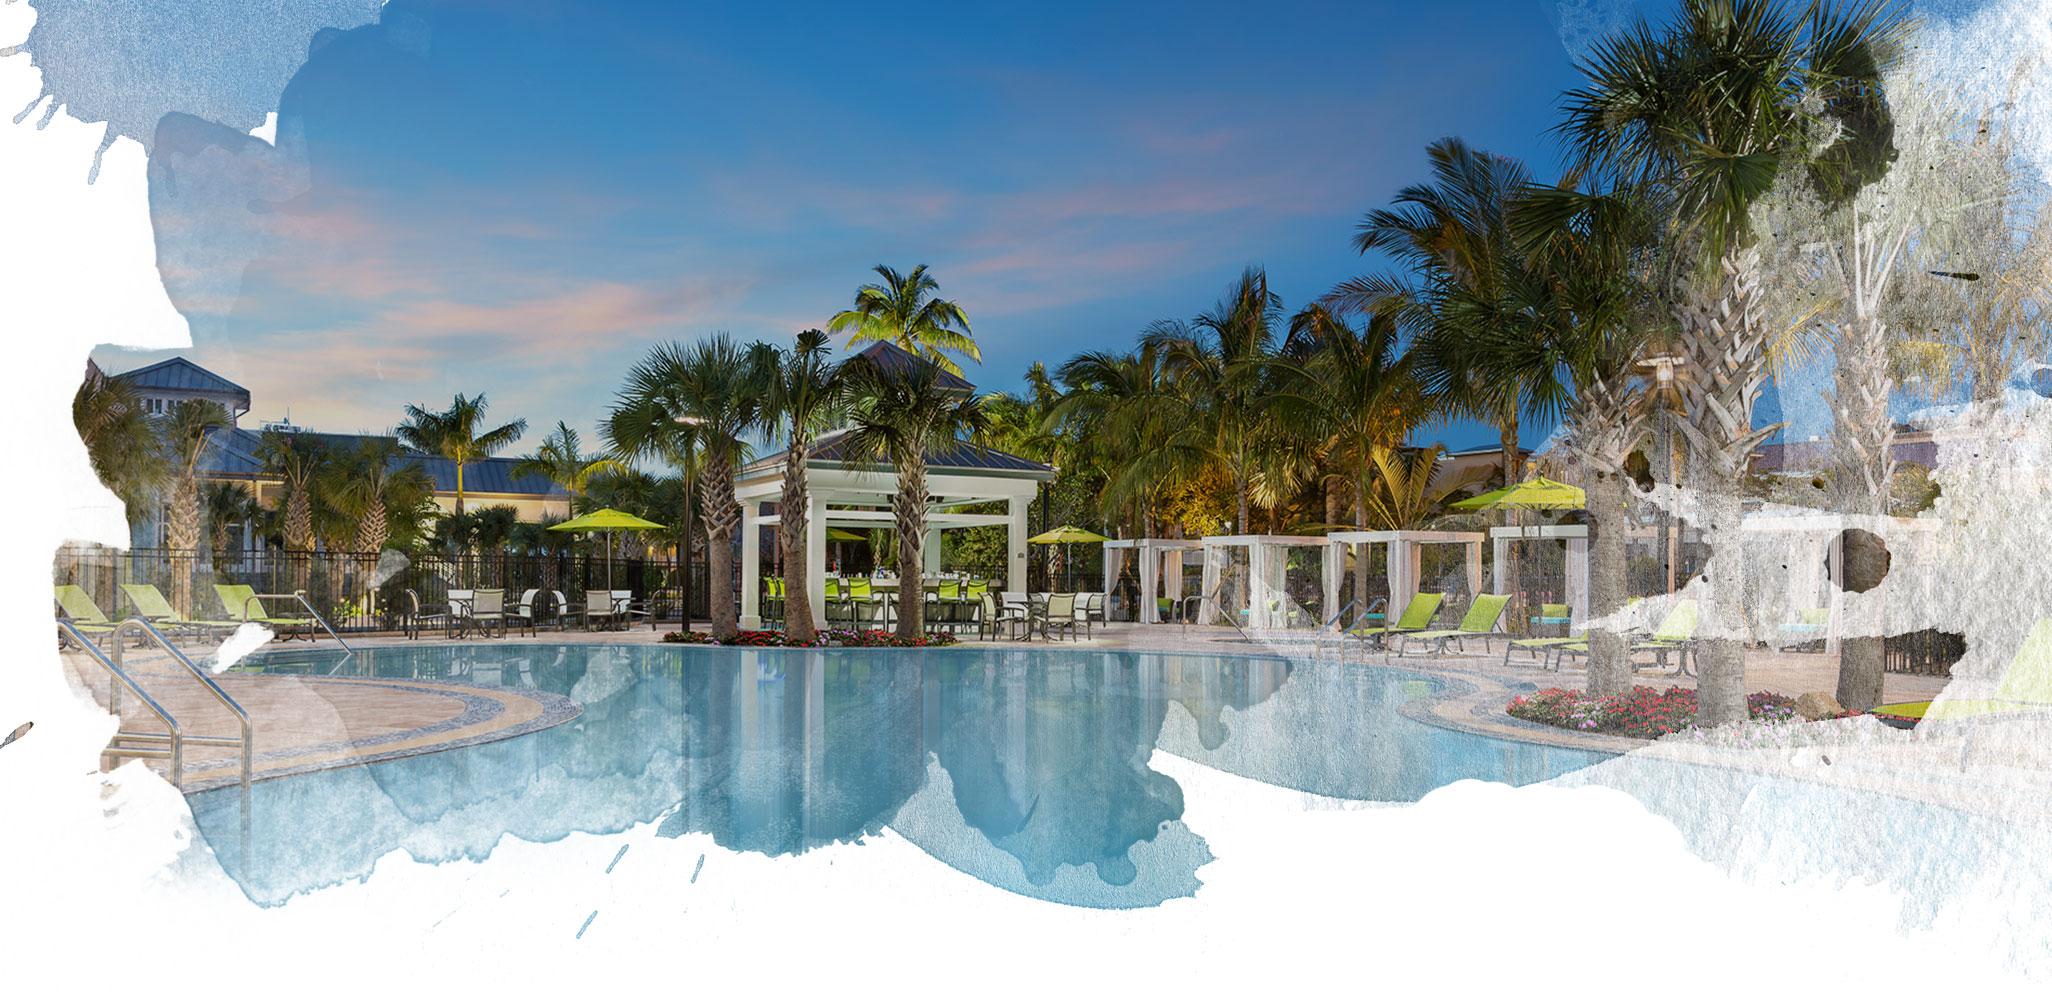 hilton garden inn - Hilton Garden Inn Key West